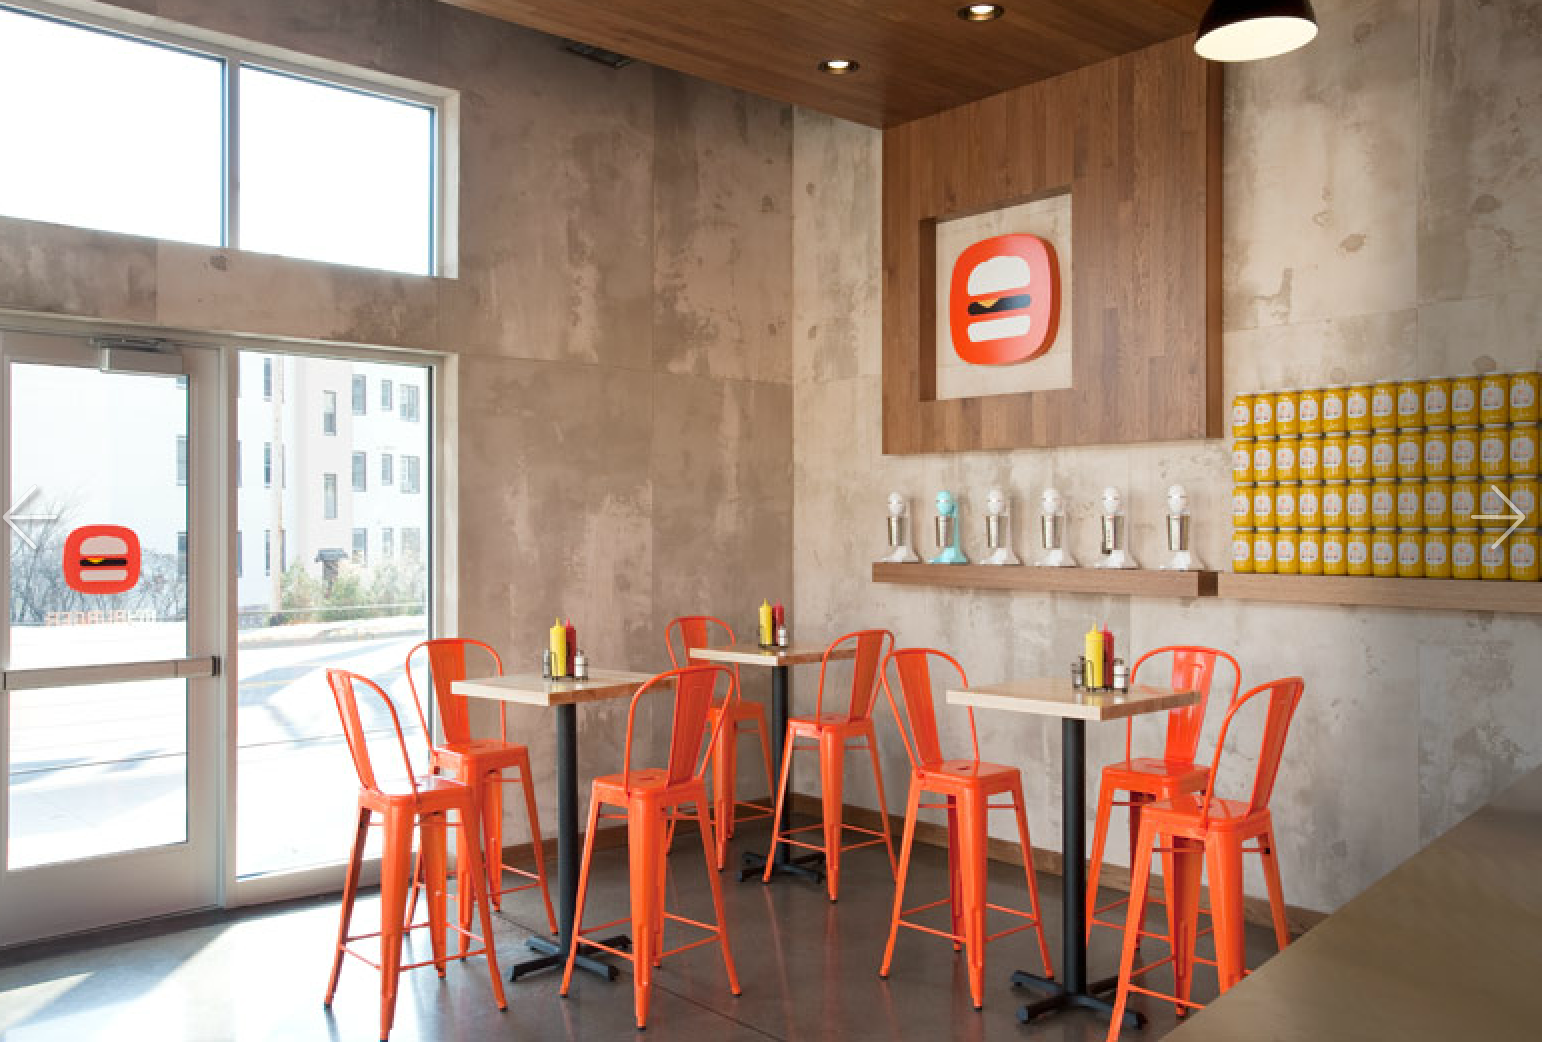 fameretail.com fast food interior design | interiors | Pinterest ...